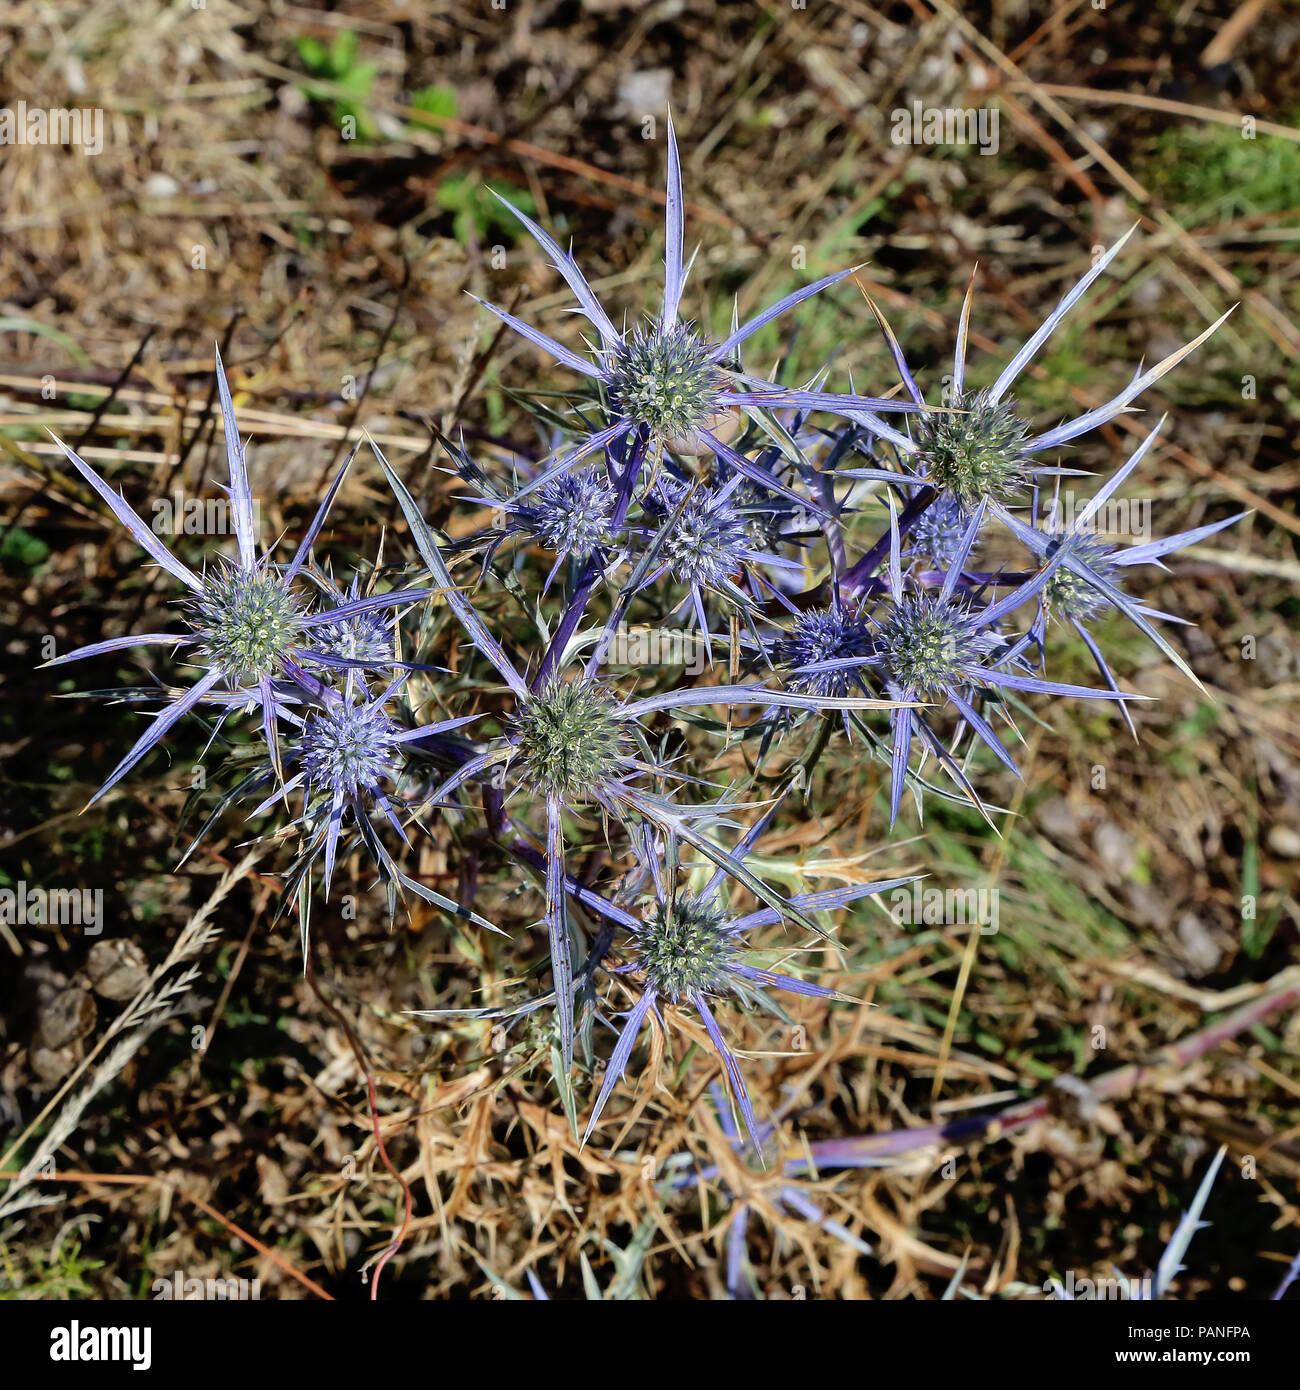 plant and inflorescences of amethyst sea holly, eryngium amethystinum Stock Photo